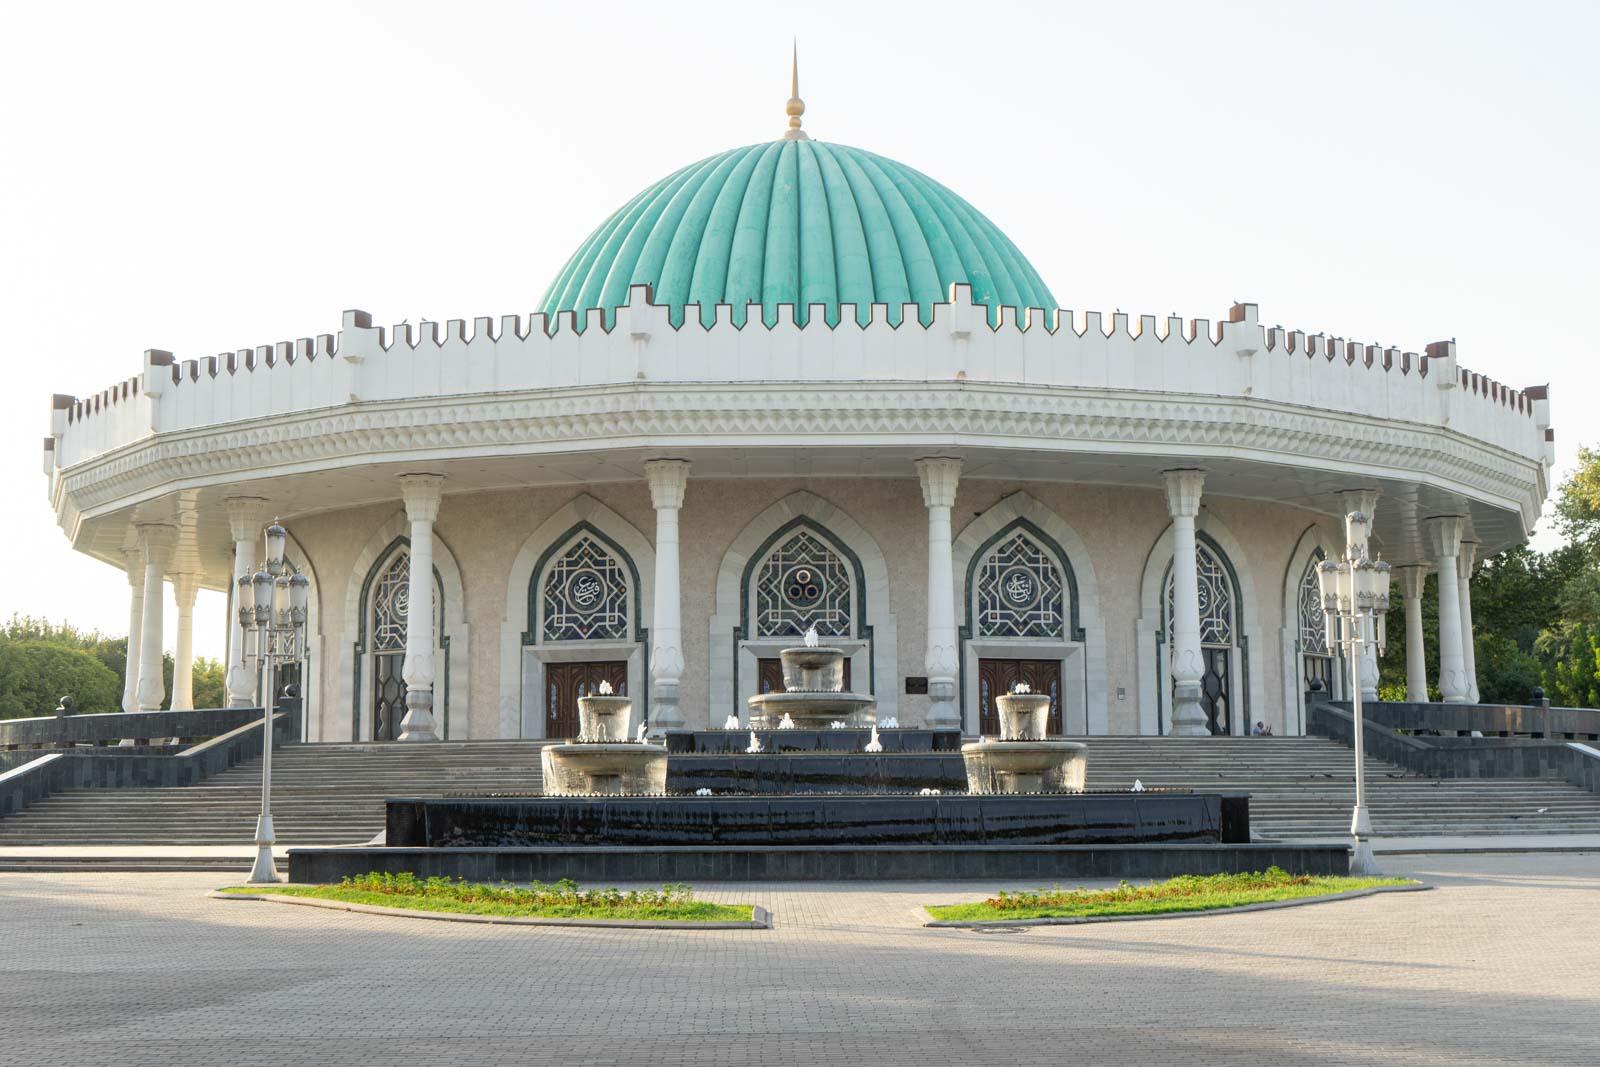 Best things to do in Tashkent, Uzbekistan